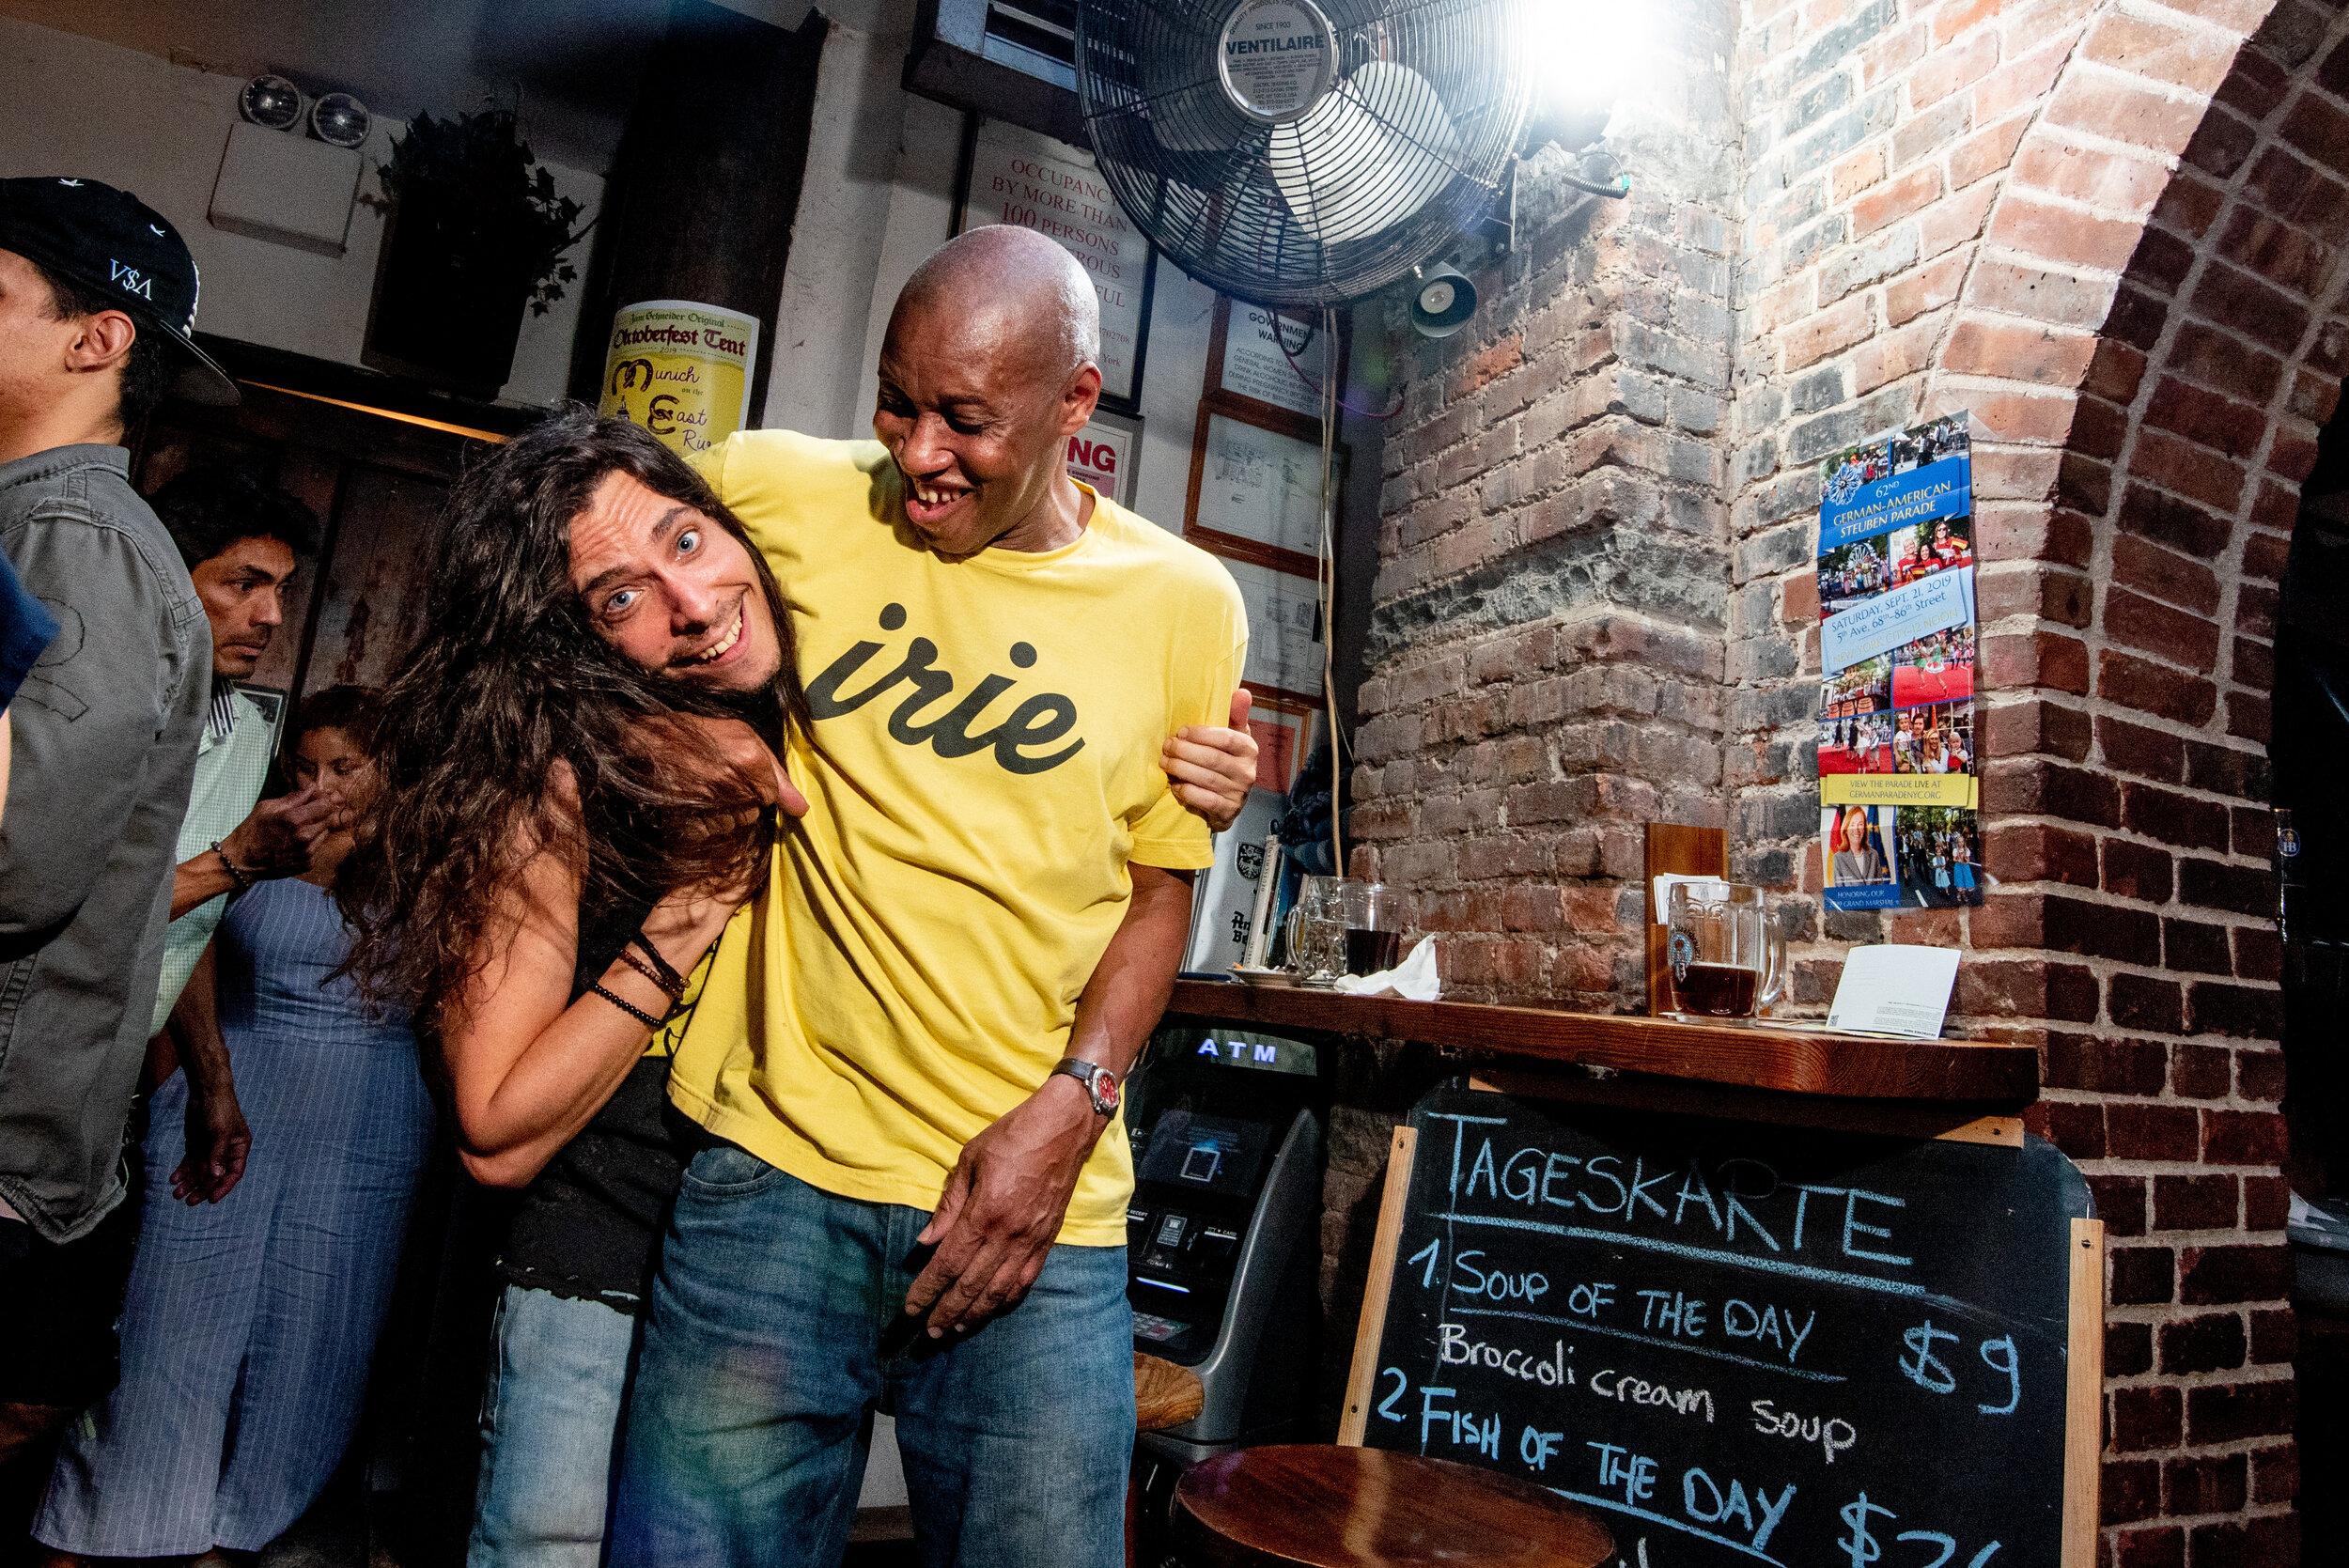 jonathan-mcphail-photography-brooklyn-new-york-nyc-event-events-photographer-2133.jpg